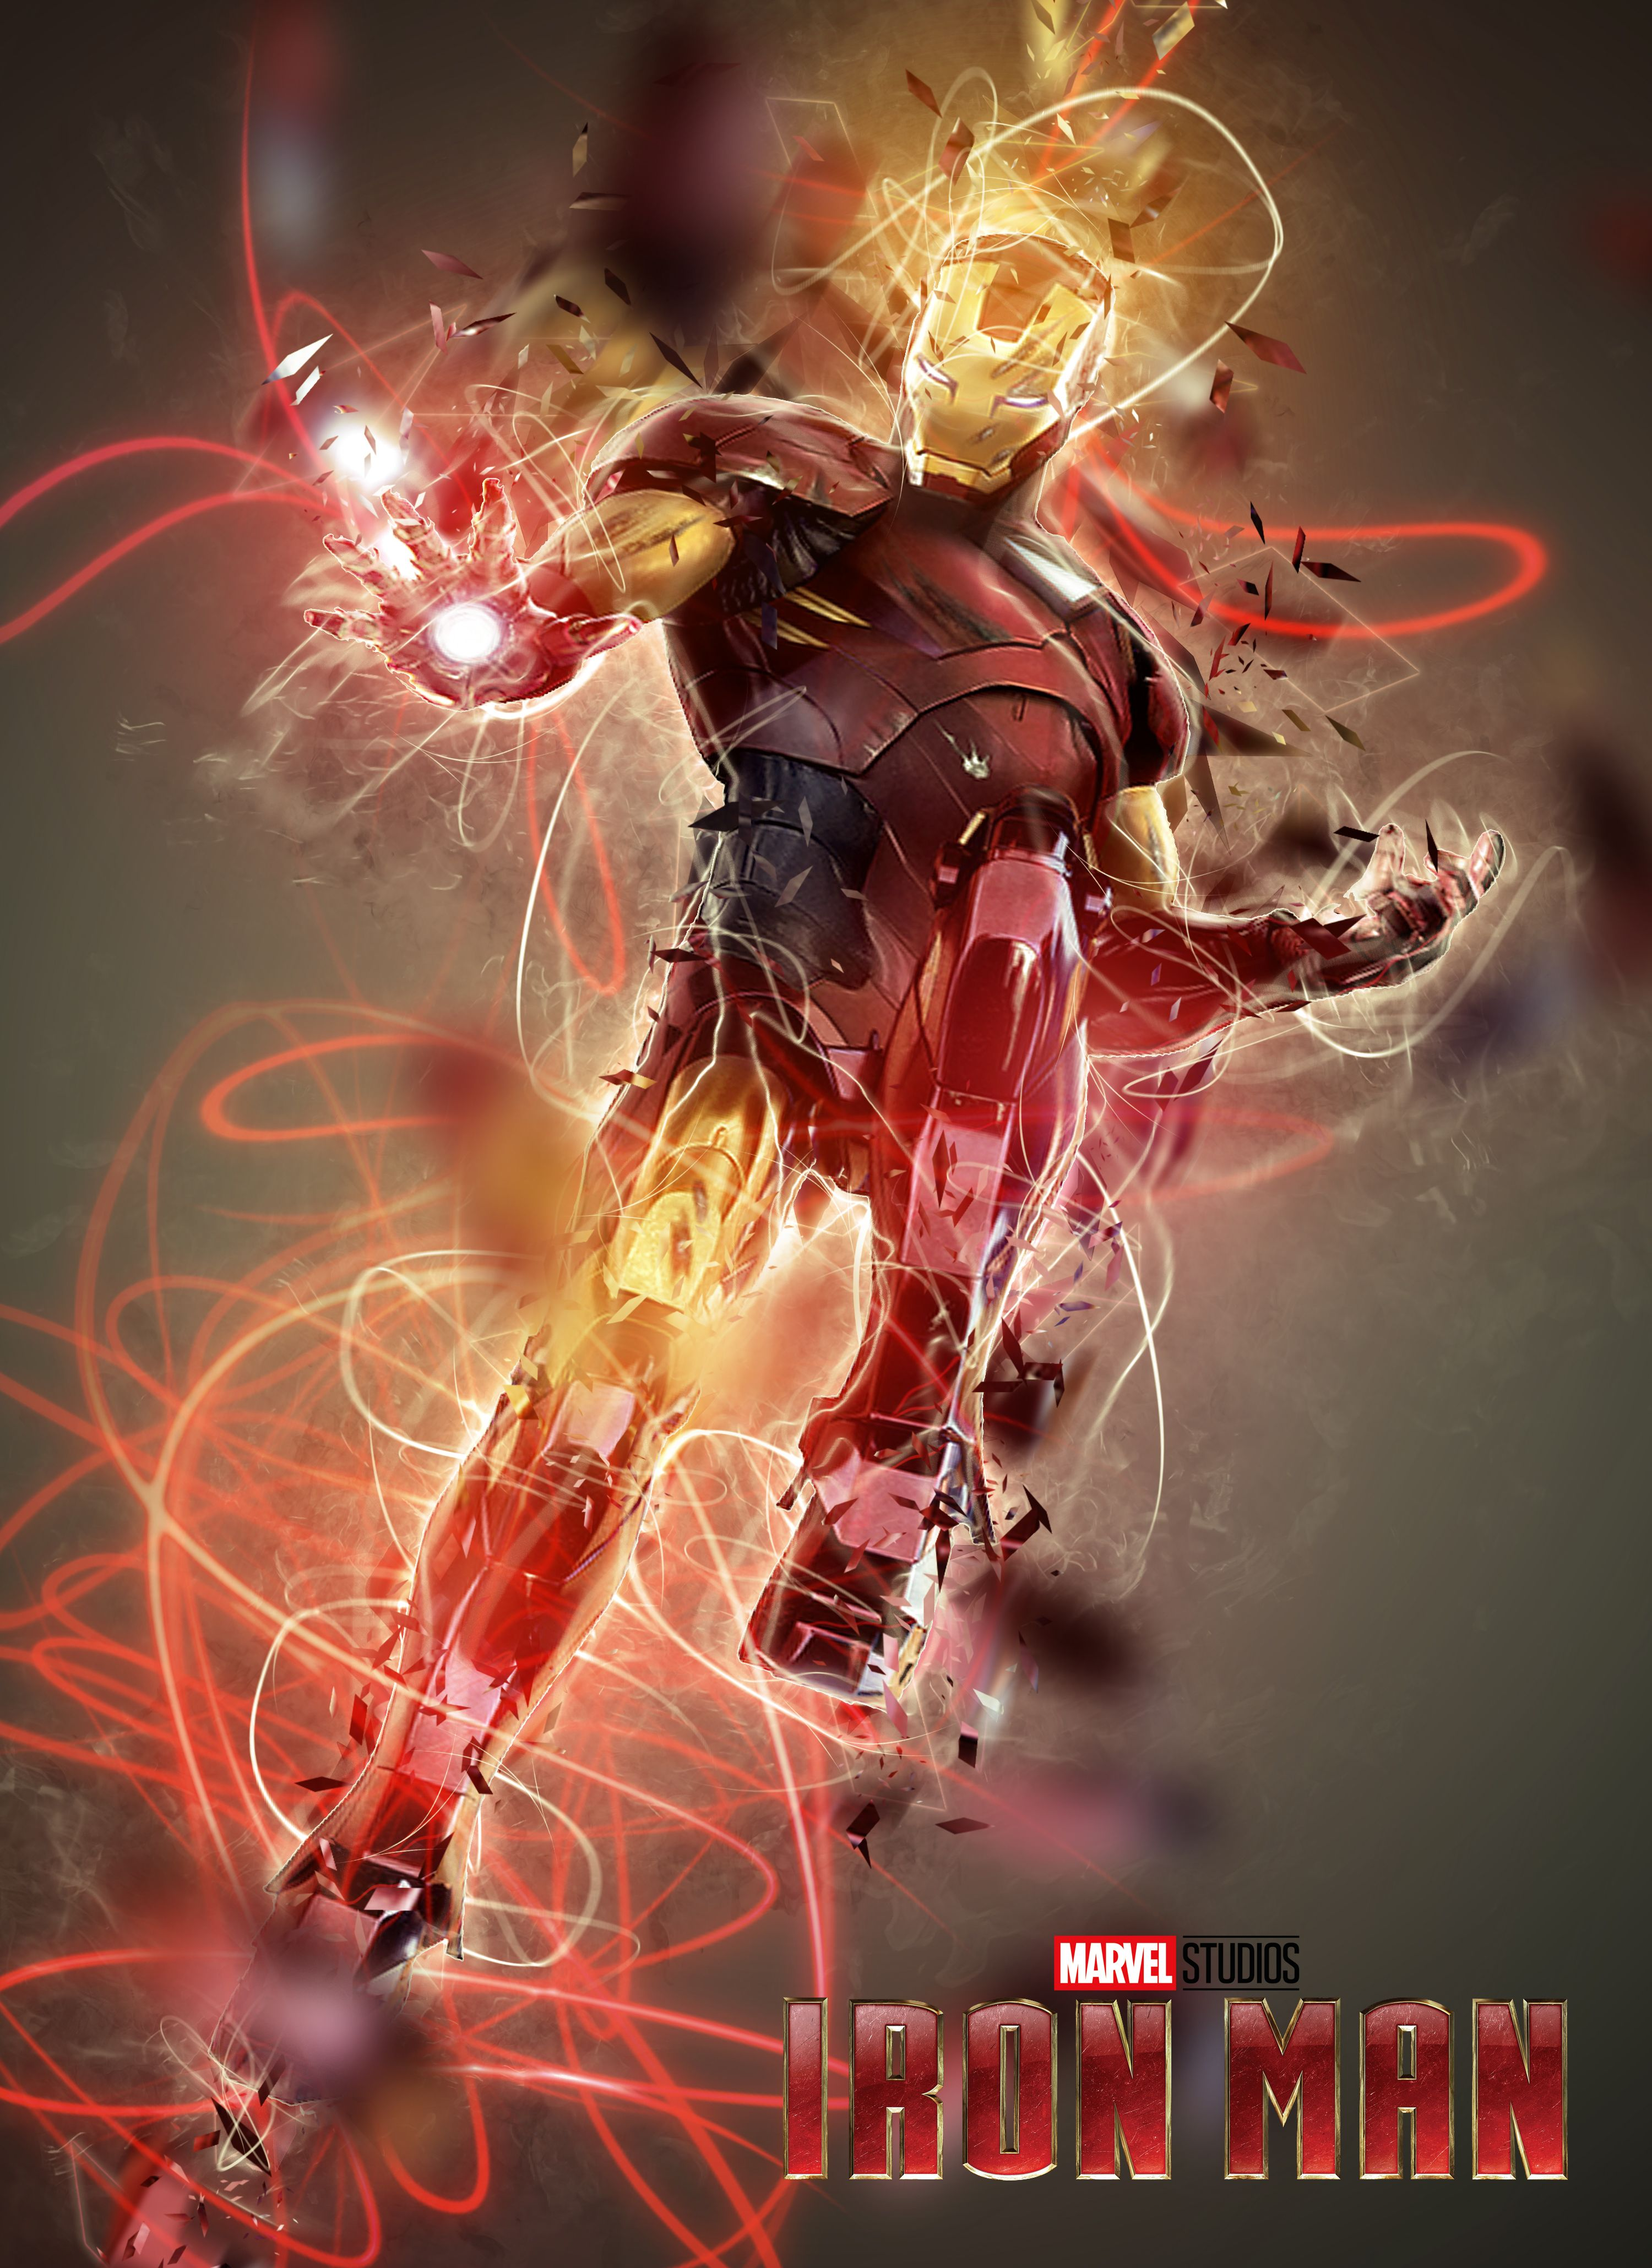 IRON MAN (PLASMA MODE) Age of ultron, Avengers infinity